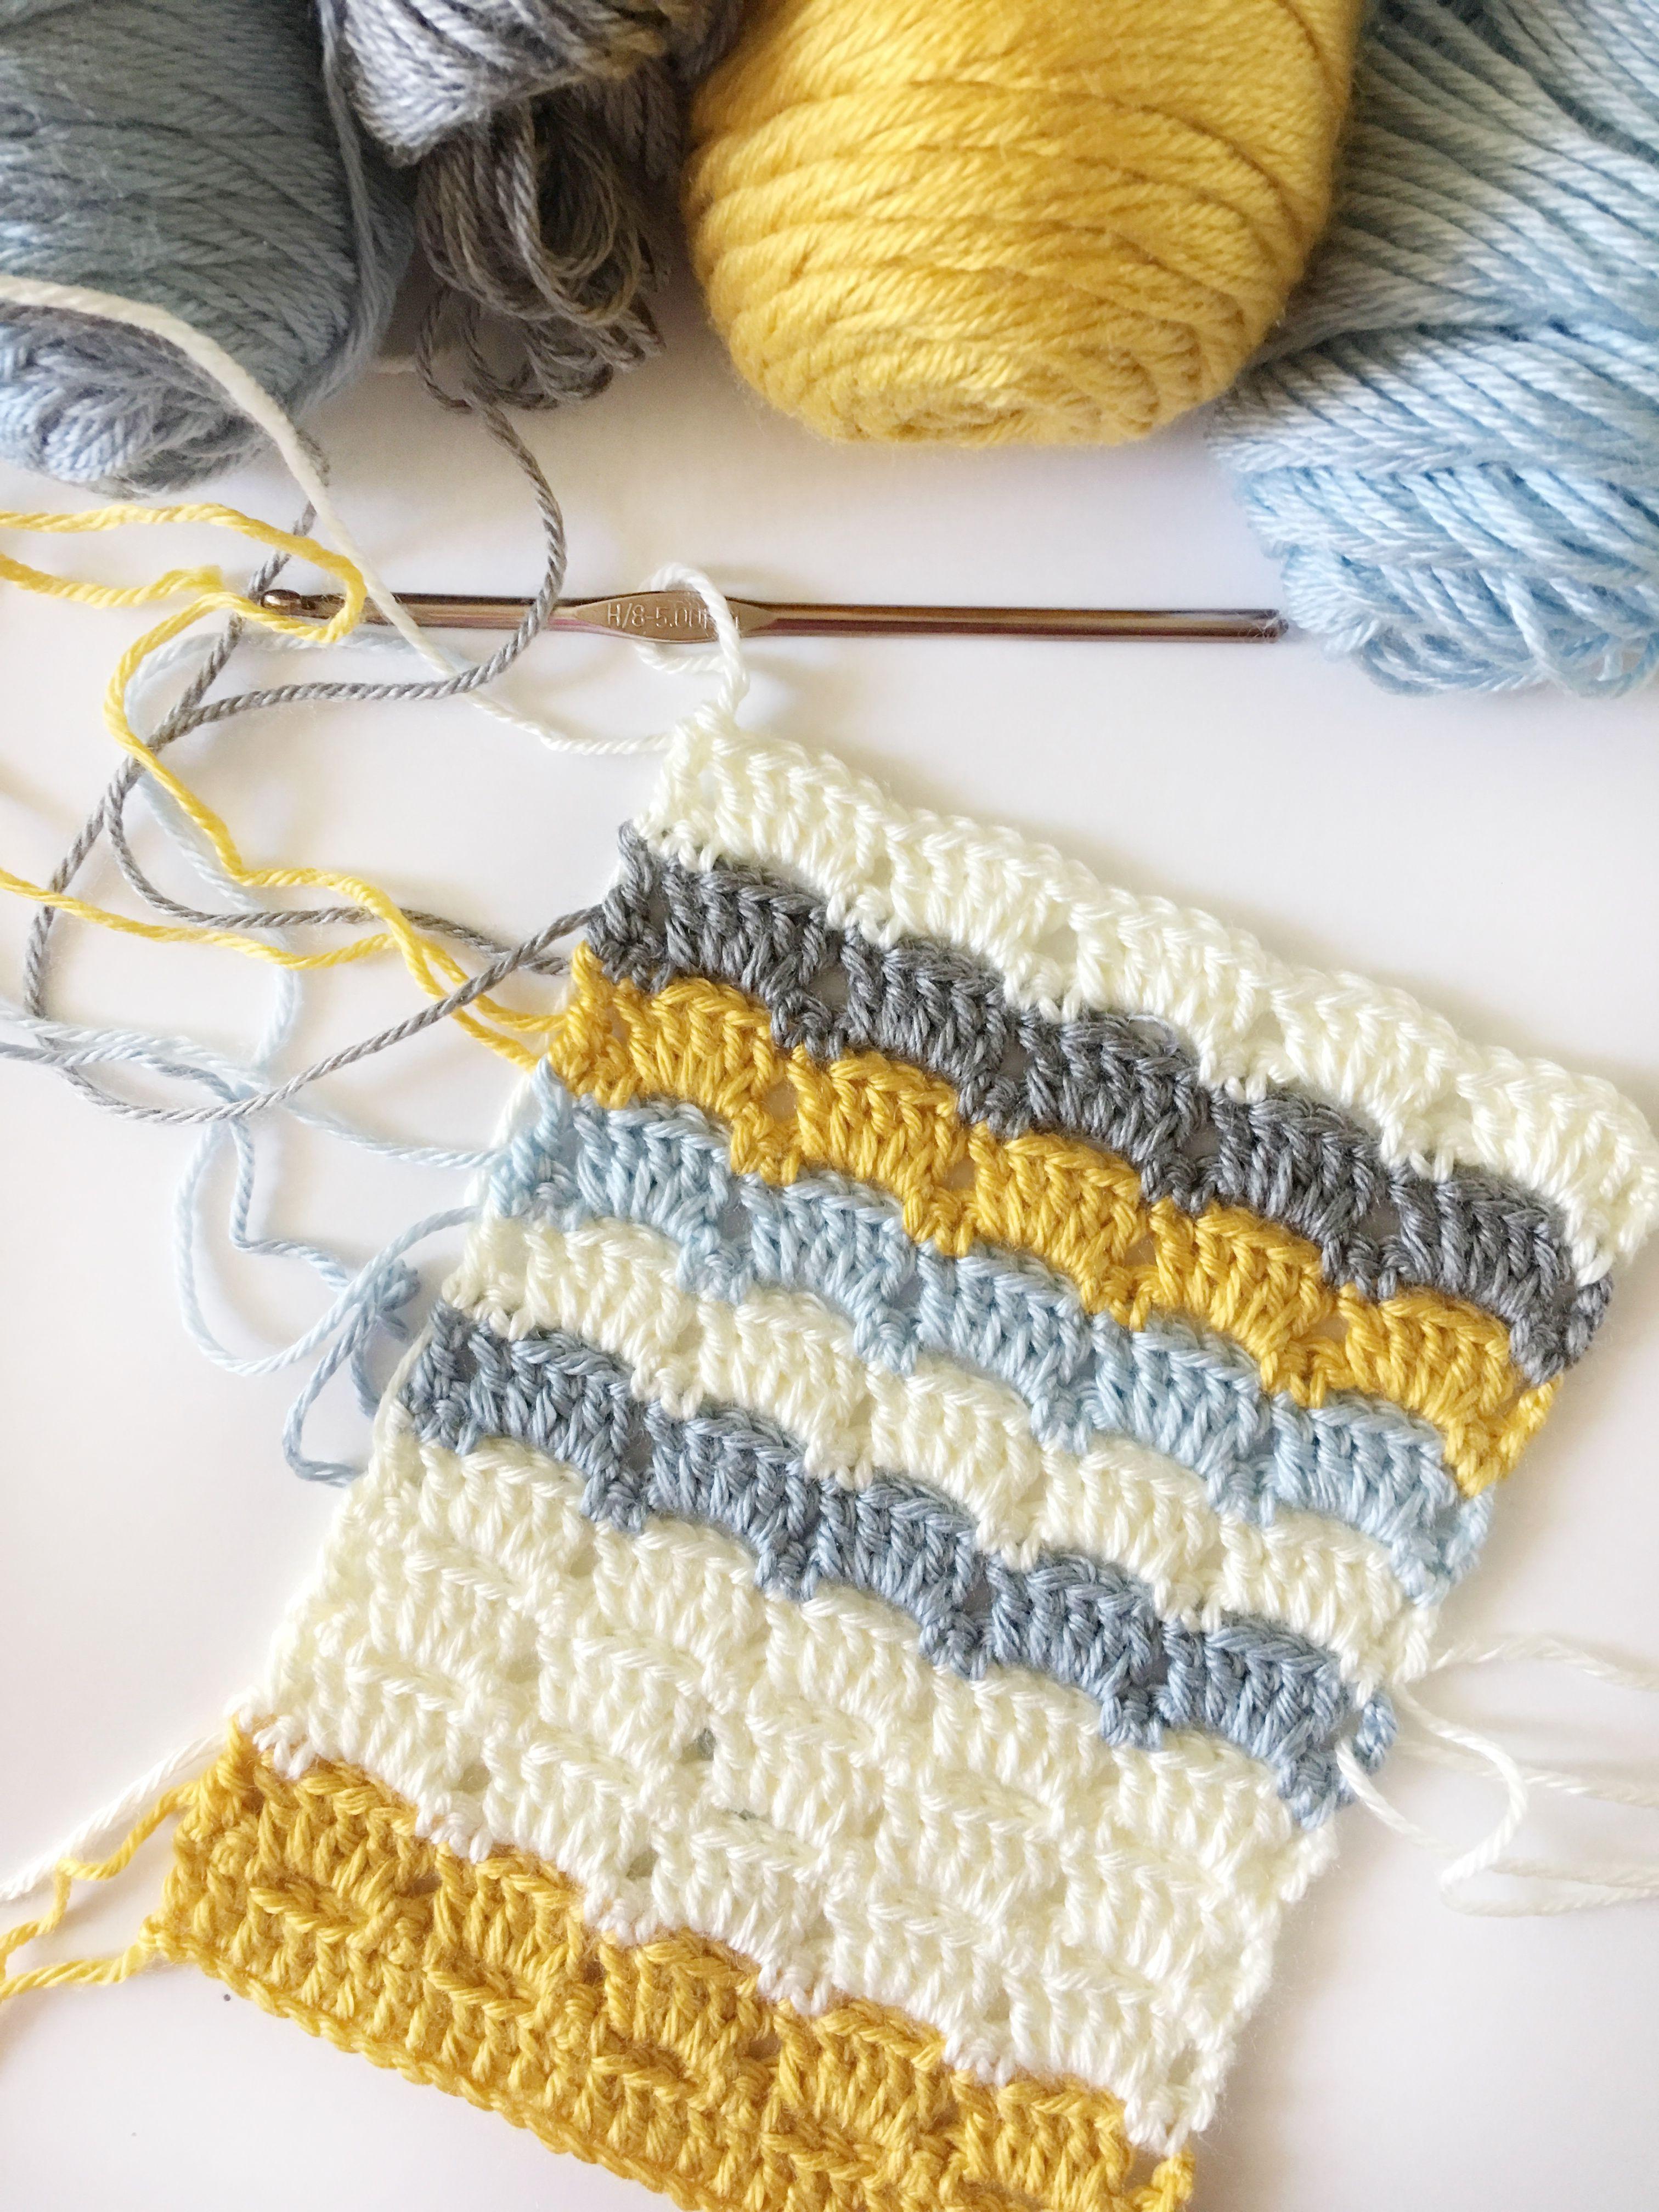 Boxed Block Stitch for Crochet - Daisy Farm Crafts | crochet ...